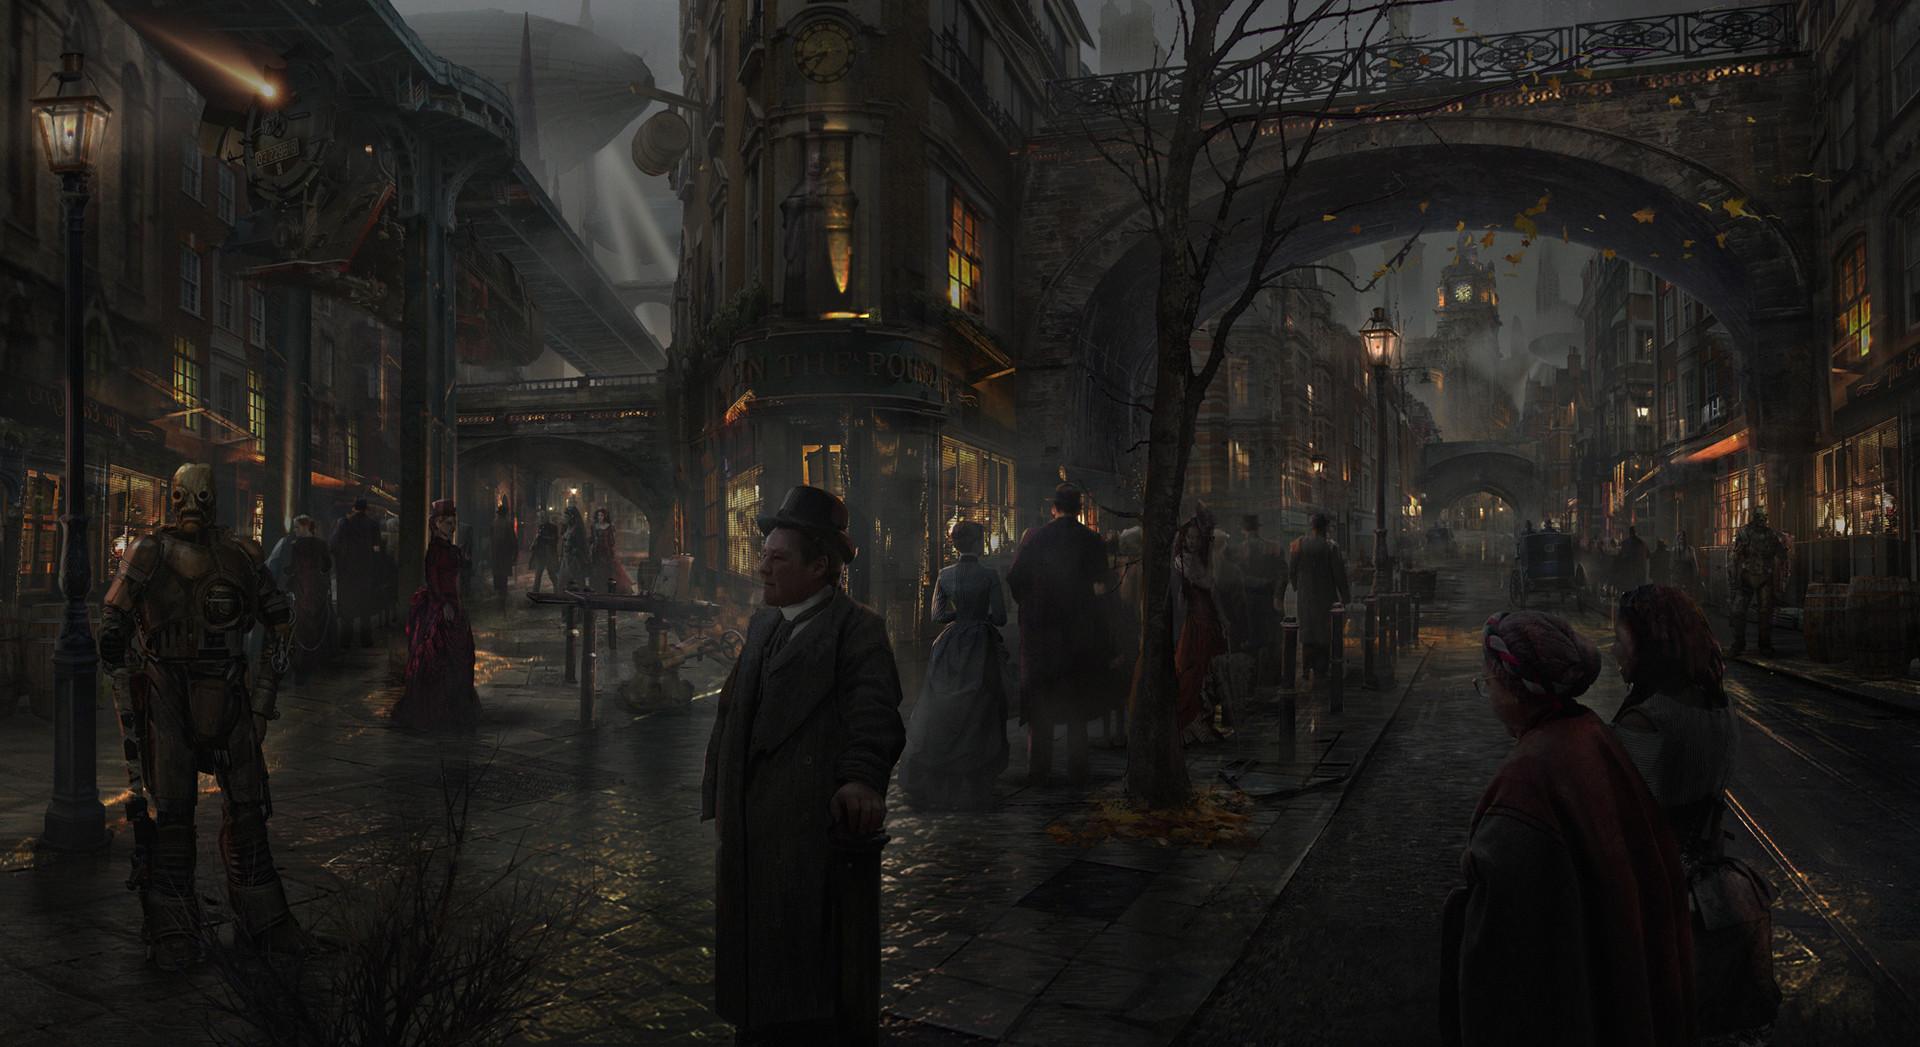 Steam City